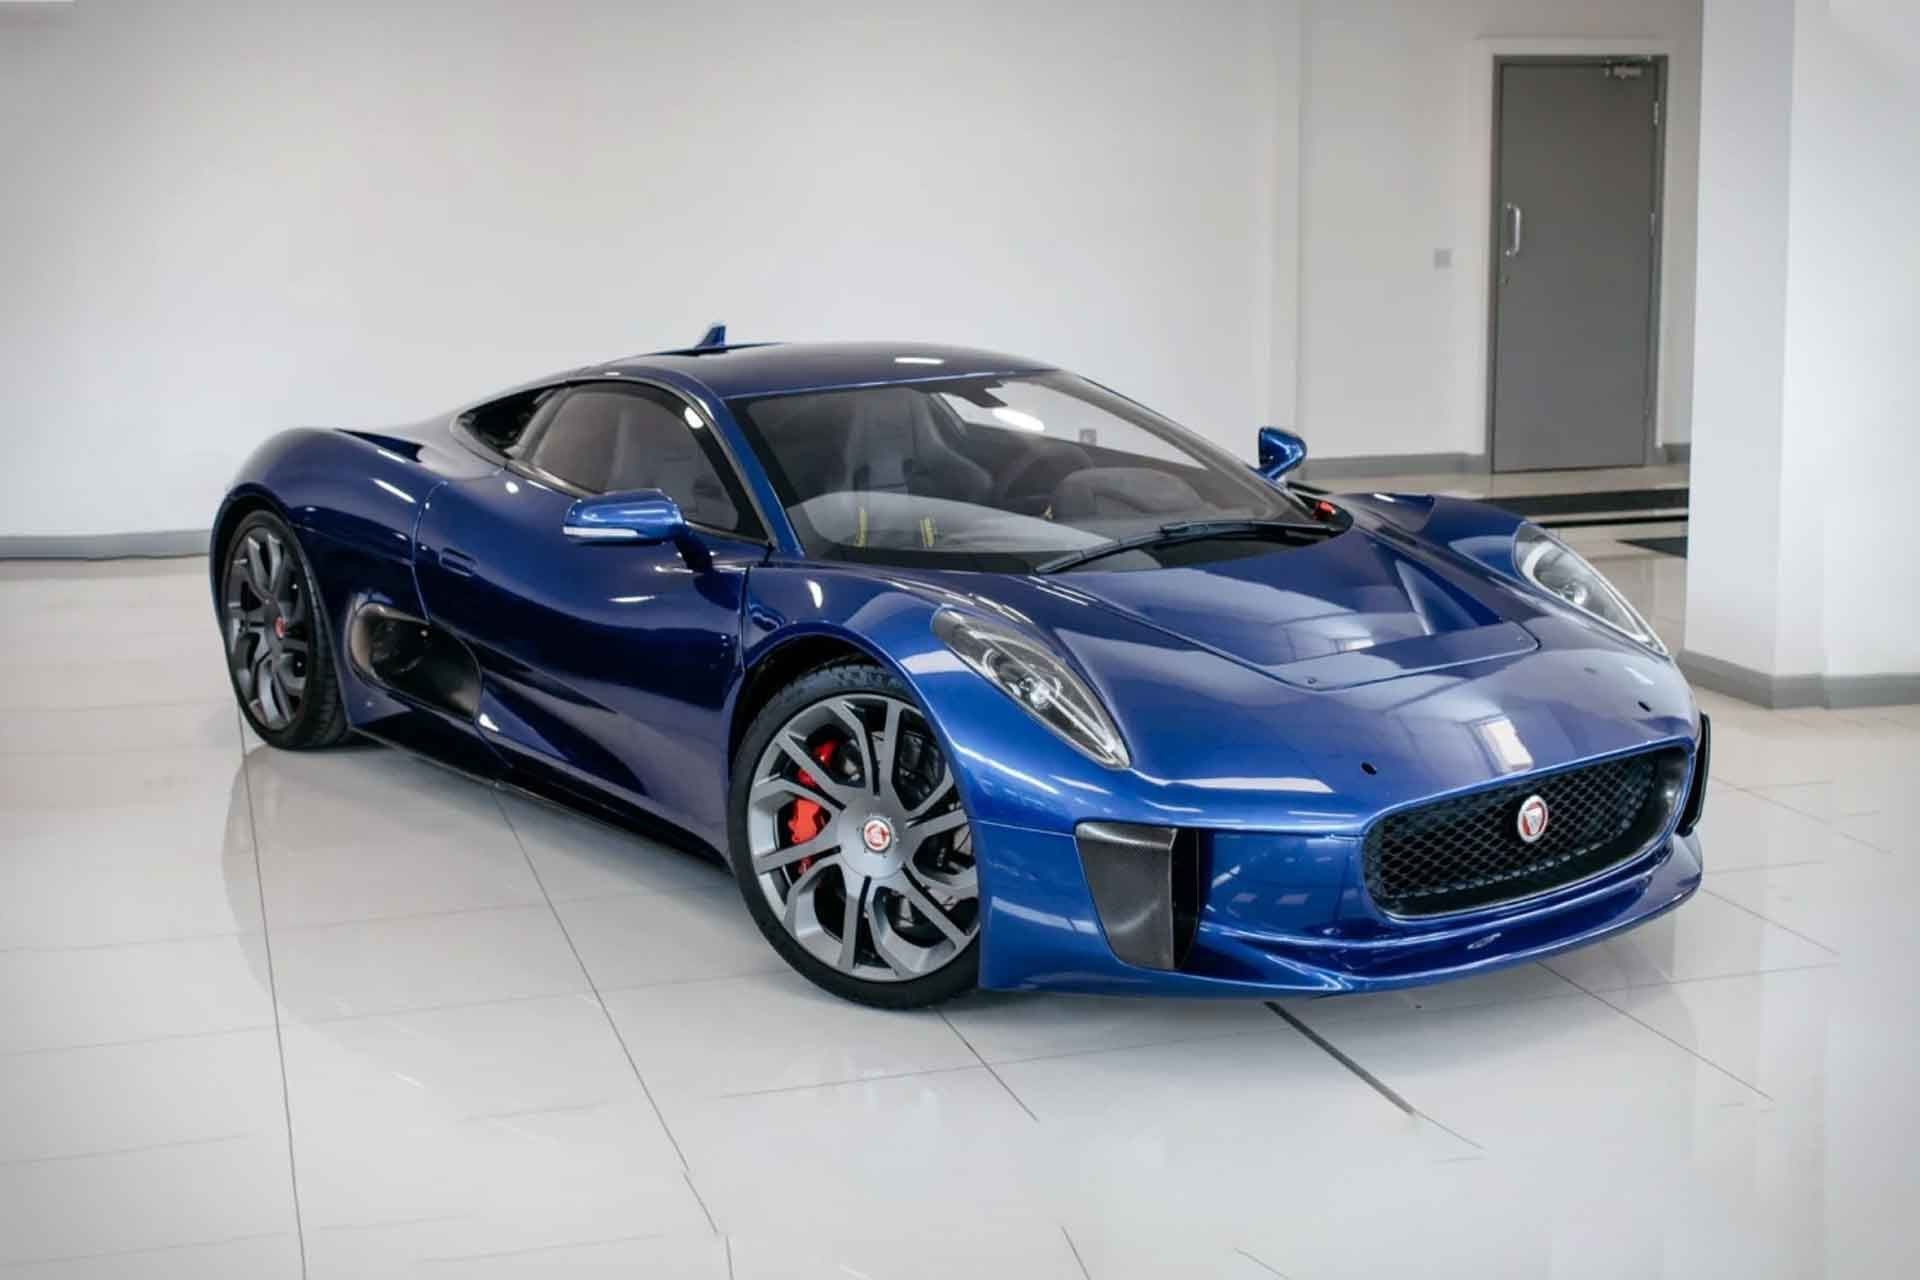 2016 Jaguar C X75 Spectre Stunt Car Jaguar Car Jaguar Car